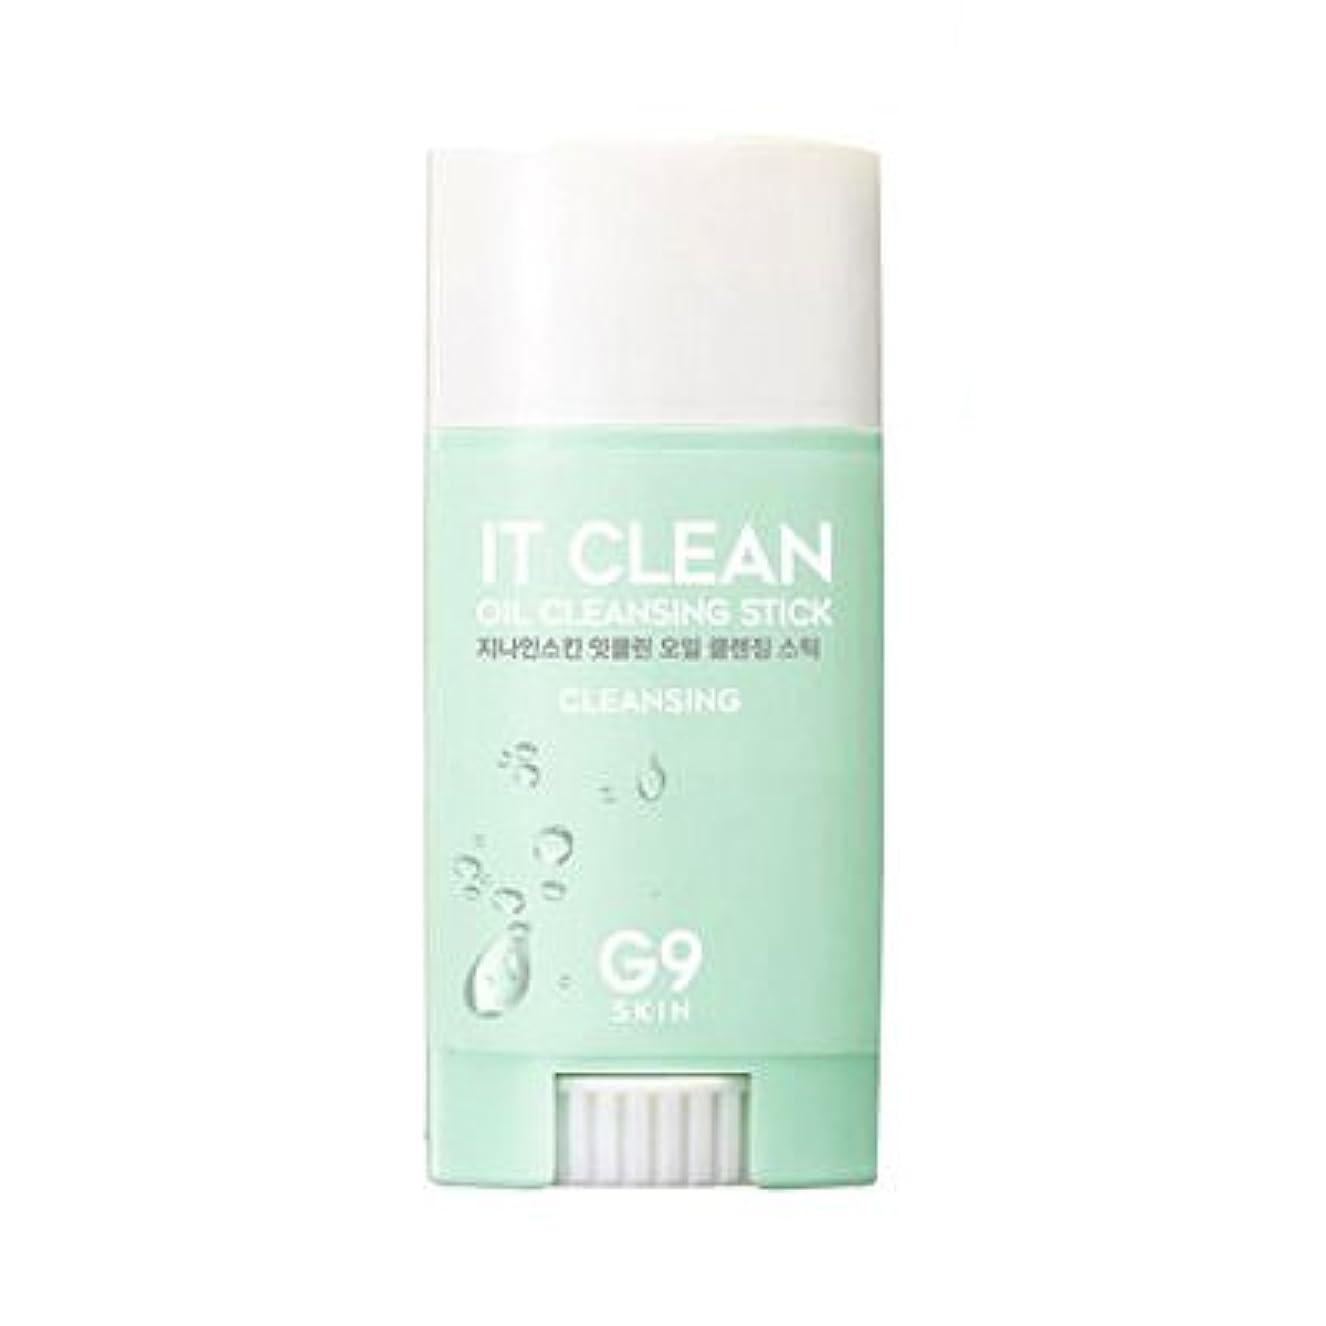 G9SKIN(ベリサム) It Clean Oil Cleansing Stick イットクリーンオイルクレンジングスティック